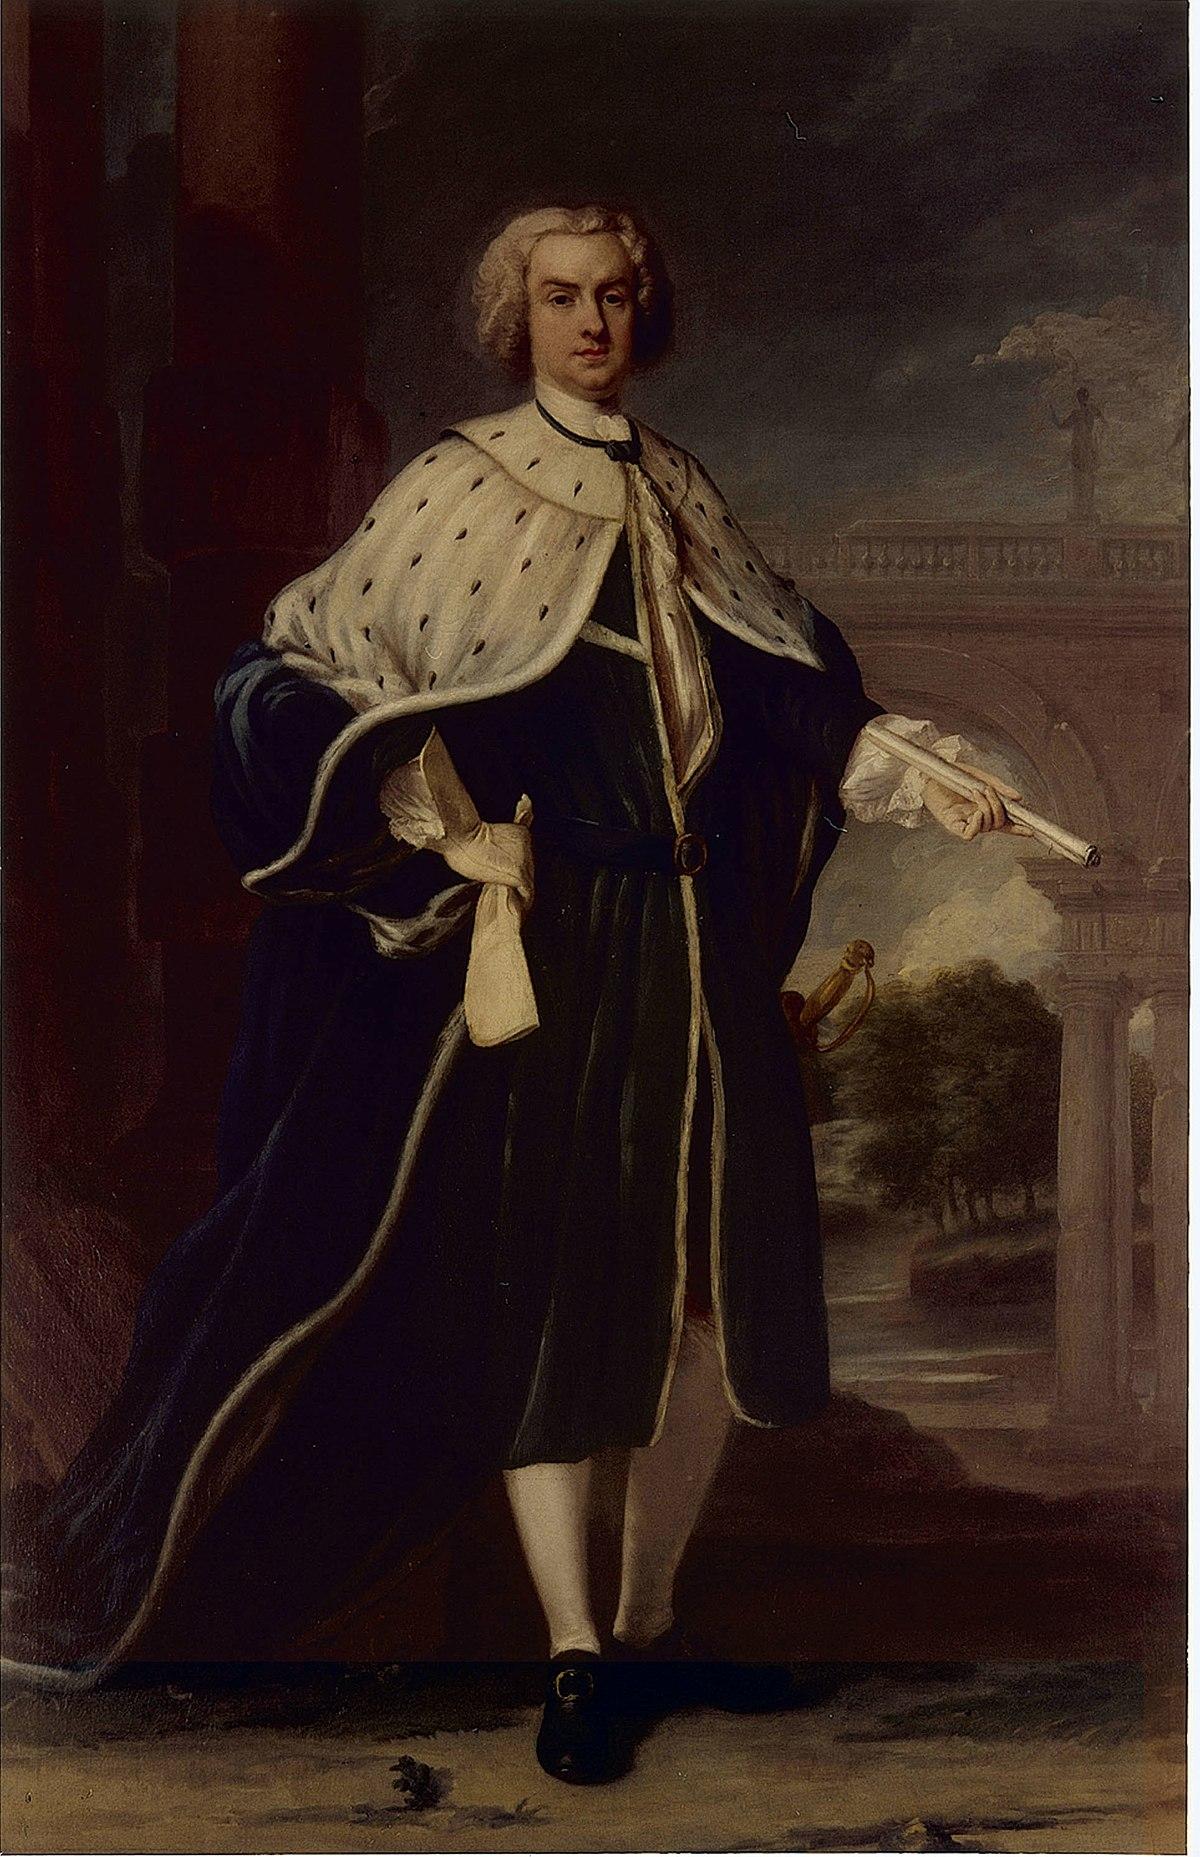 Charles Calvert, 5th Baron Baltimore